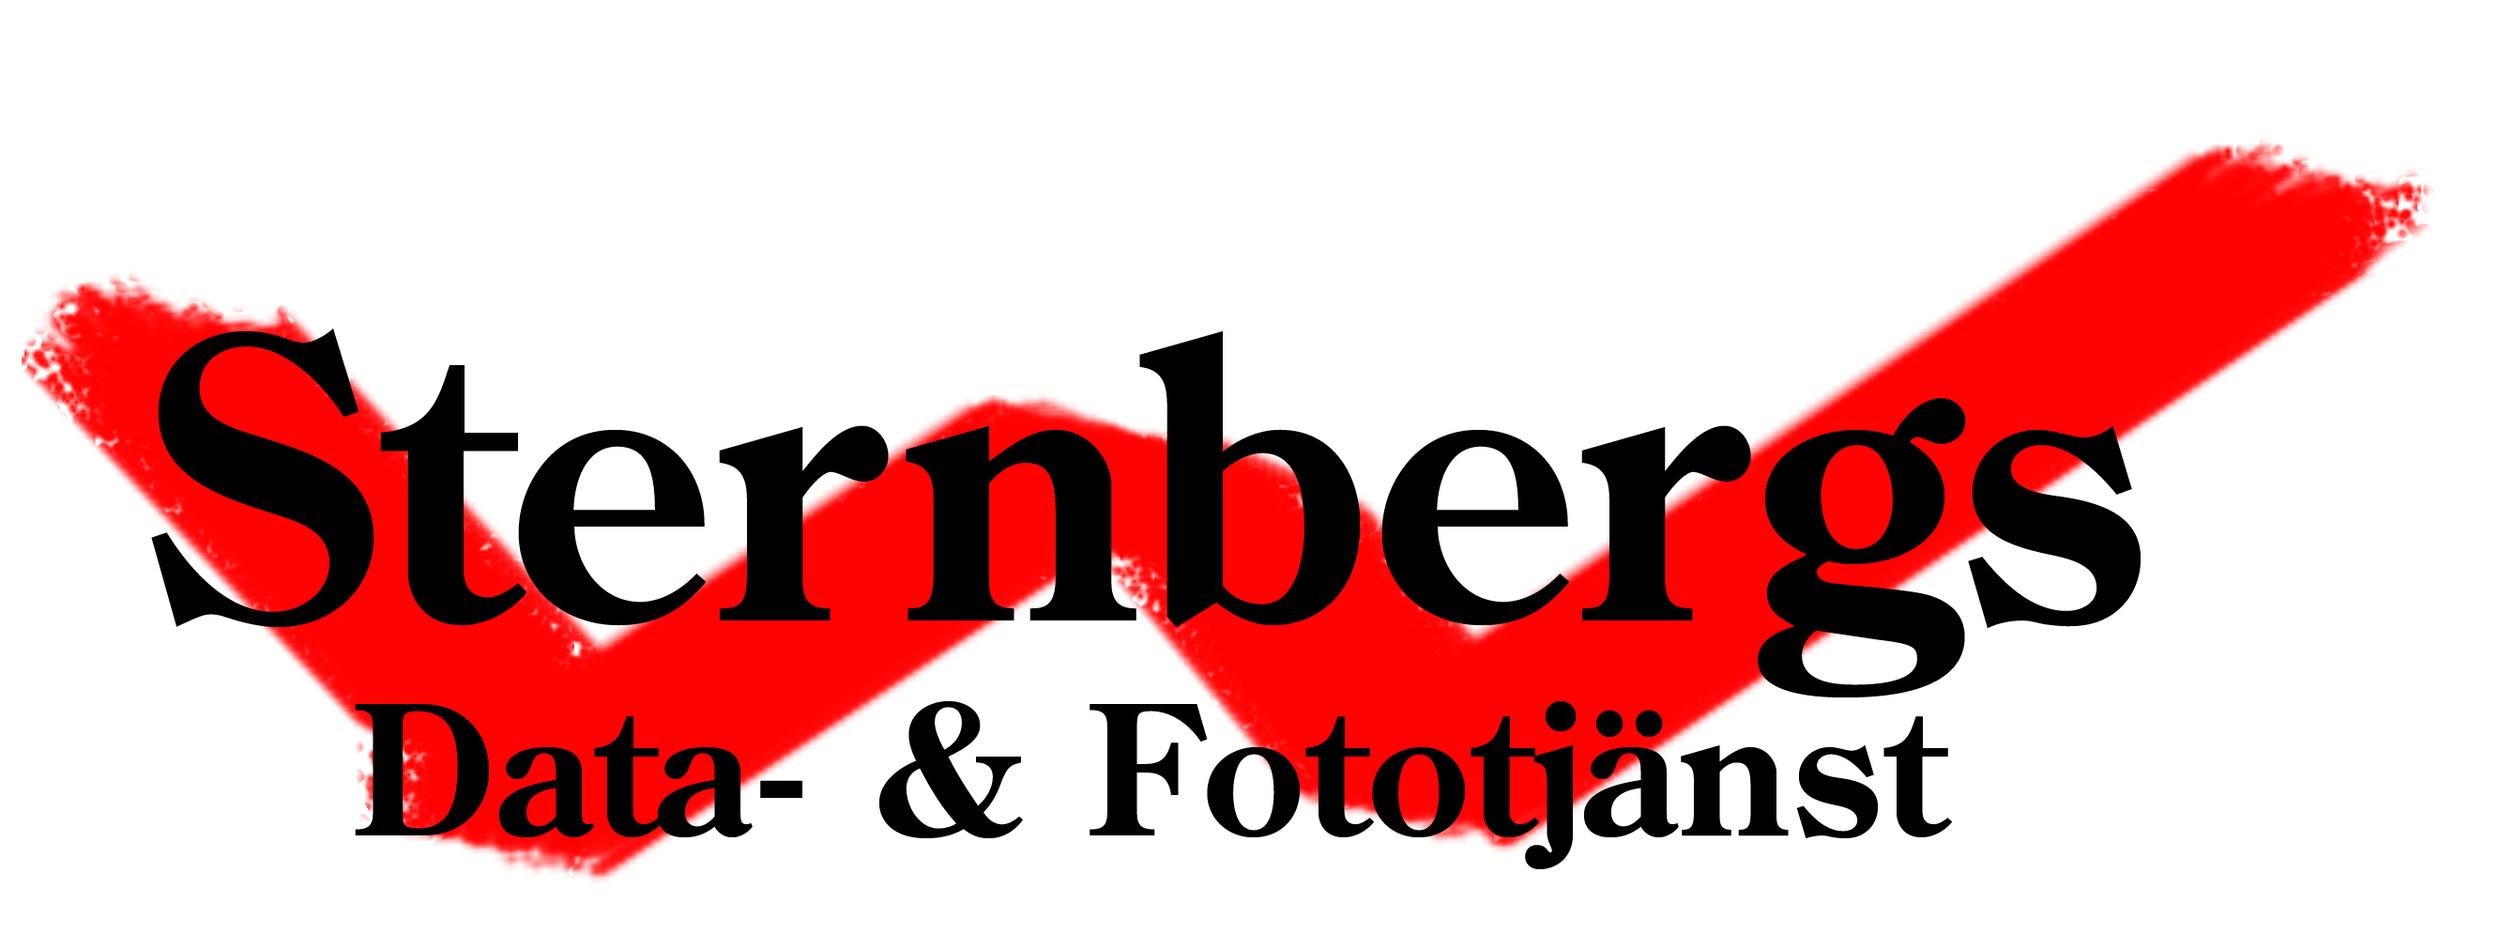 sternbergs-NY-logo.jpg